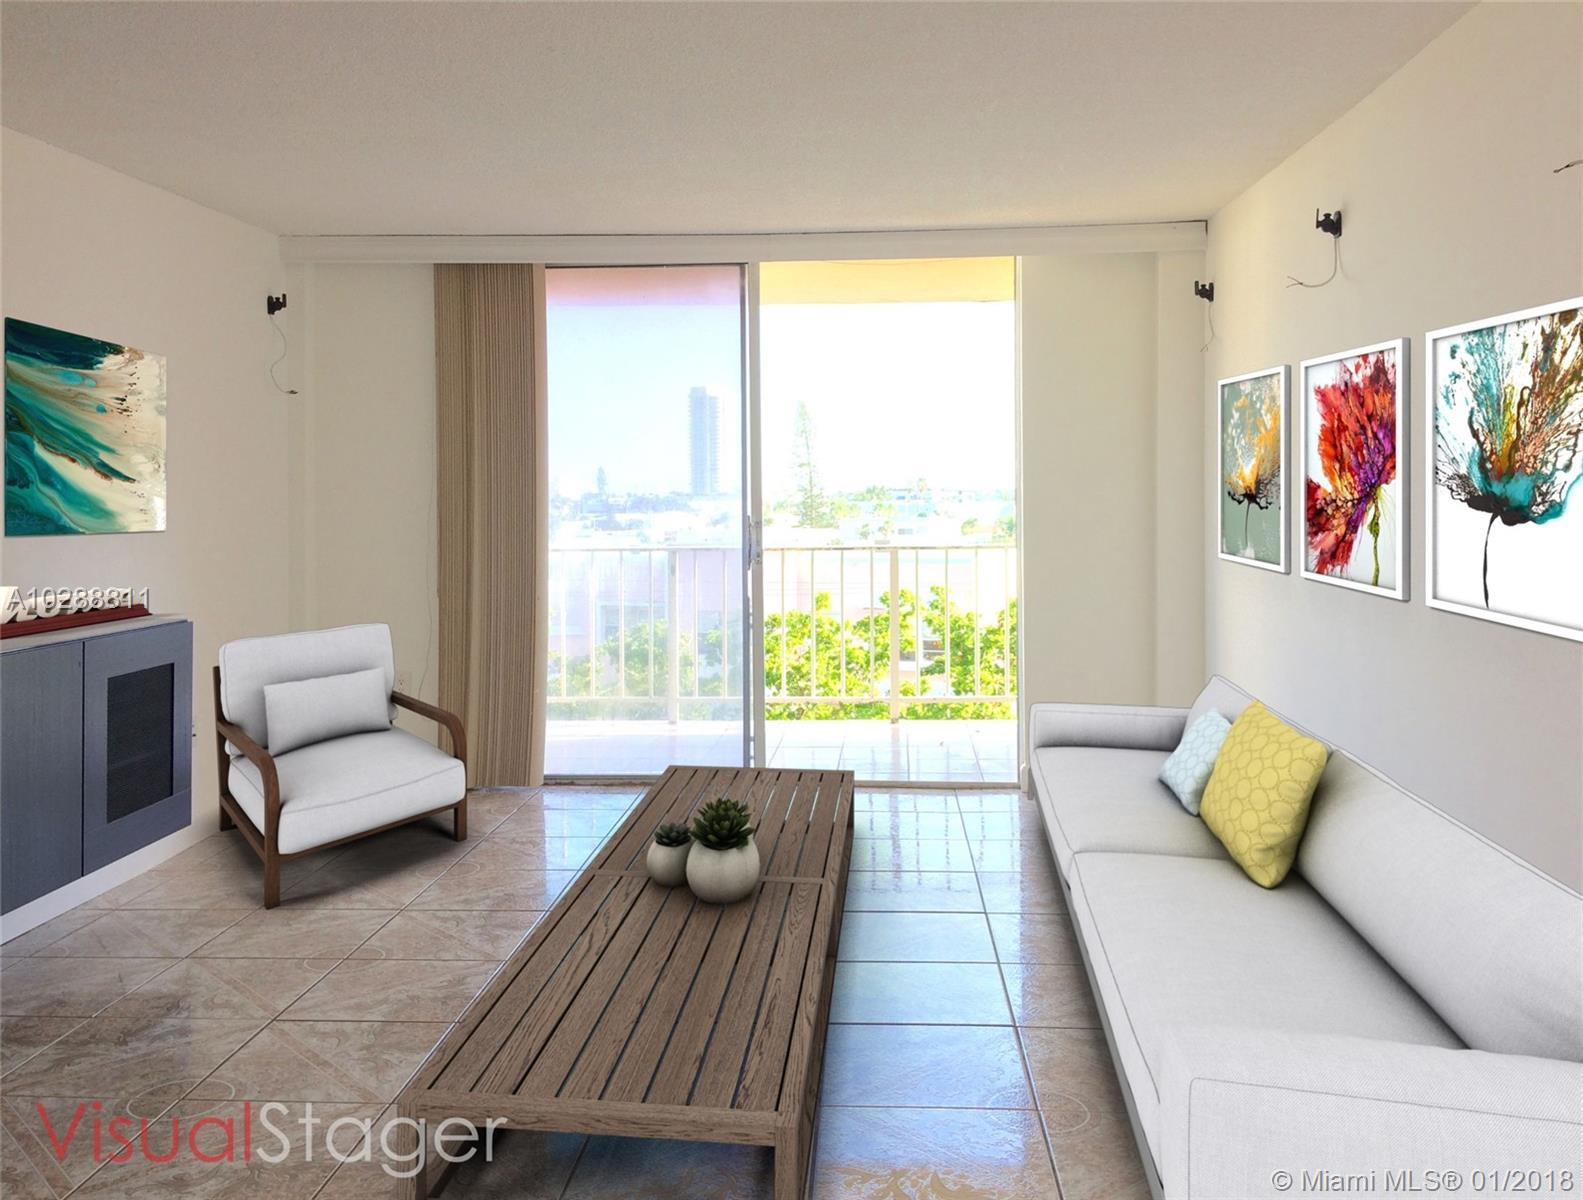 6900 Bay Dr #5F, Miami Beach, FL 33141 - MLS A10288811 - Coldwell Banker